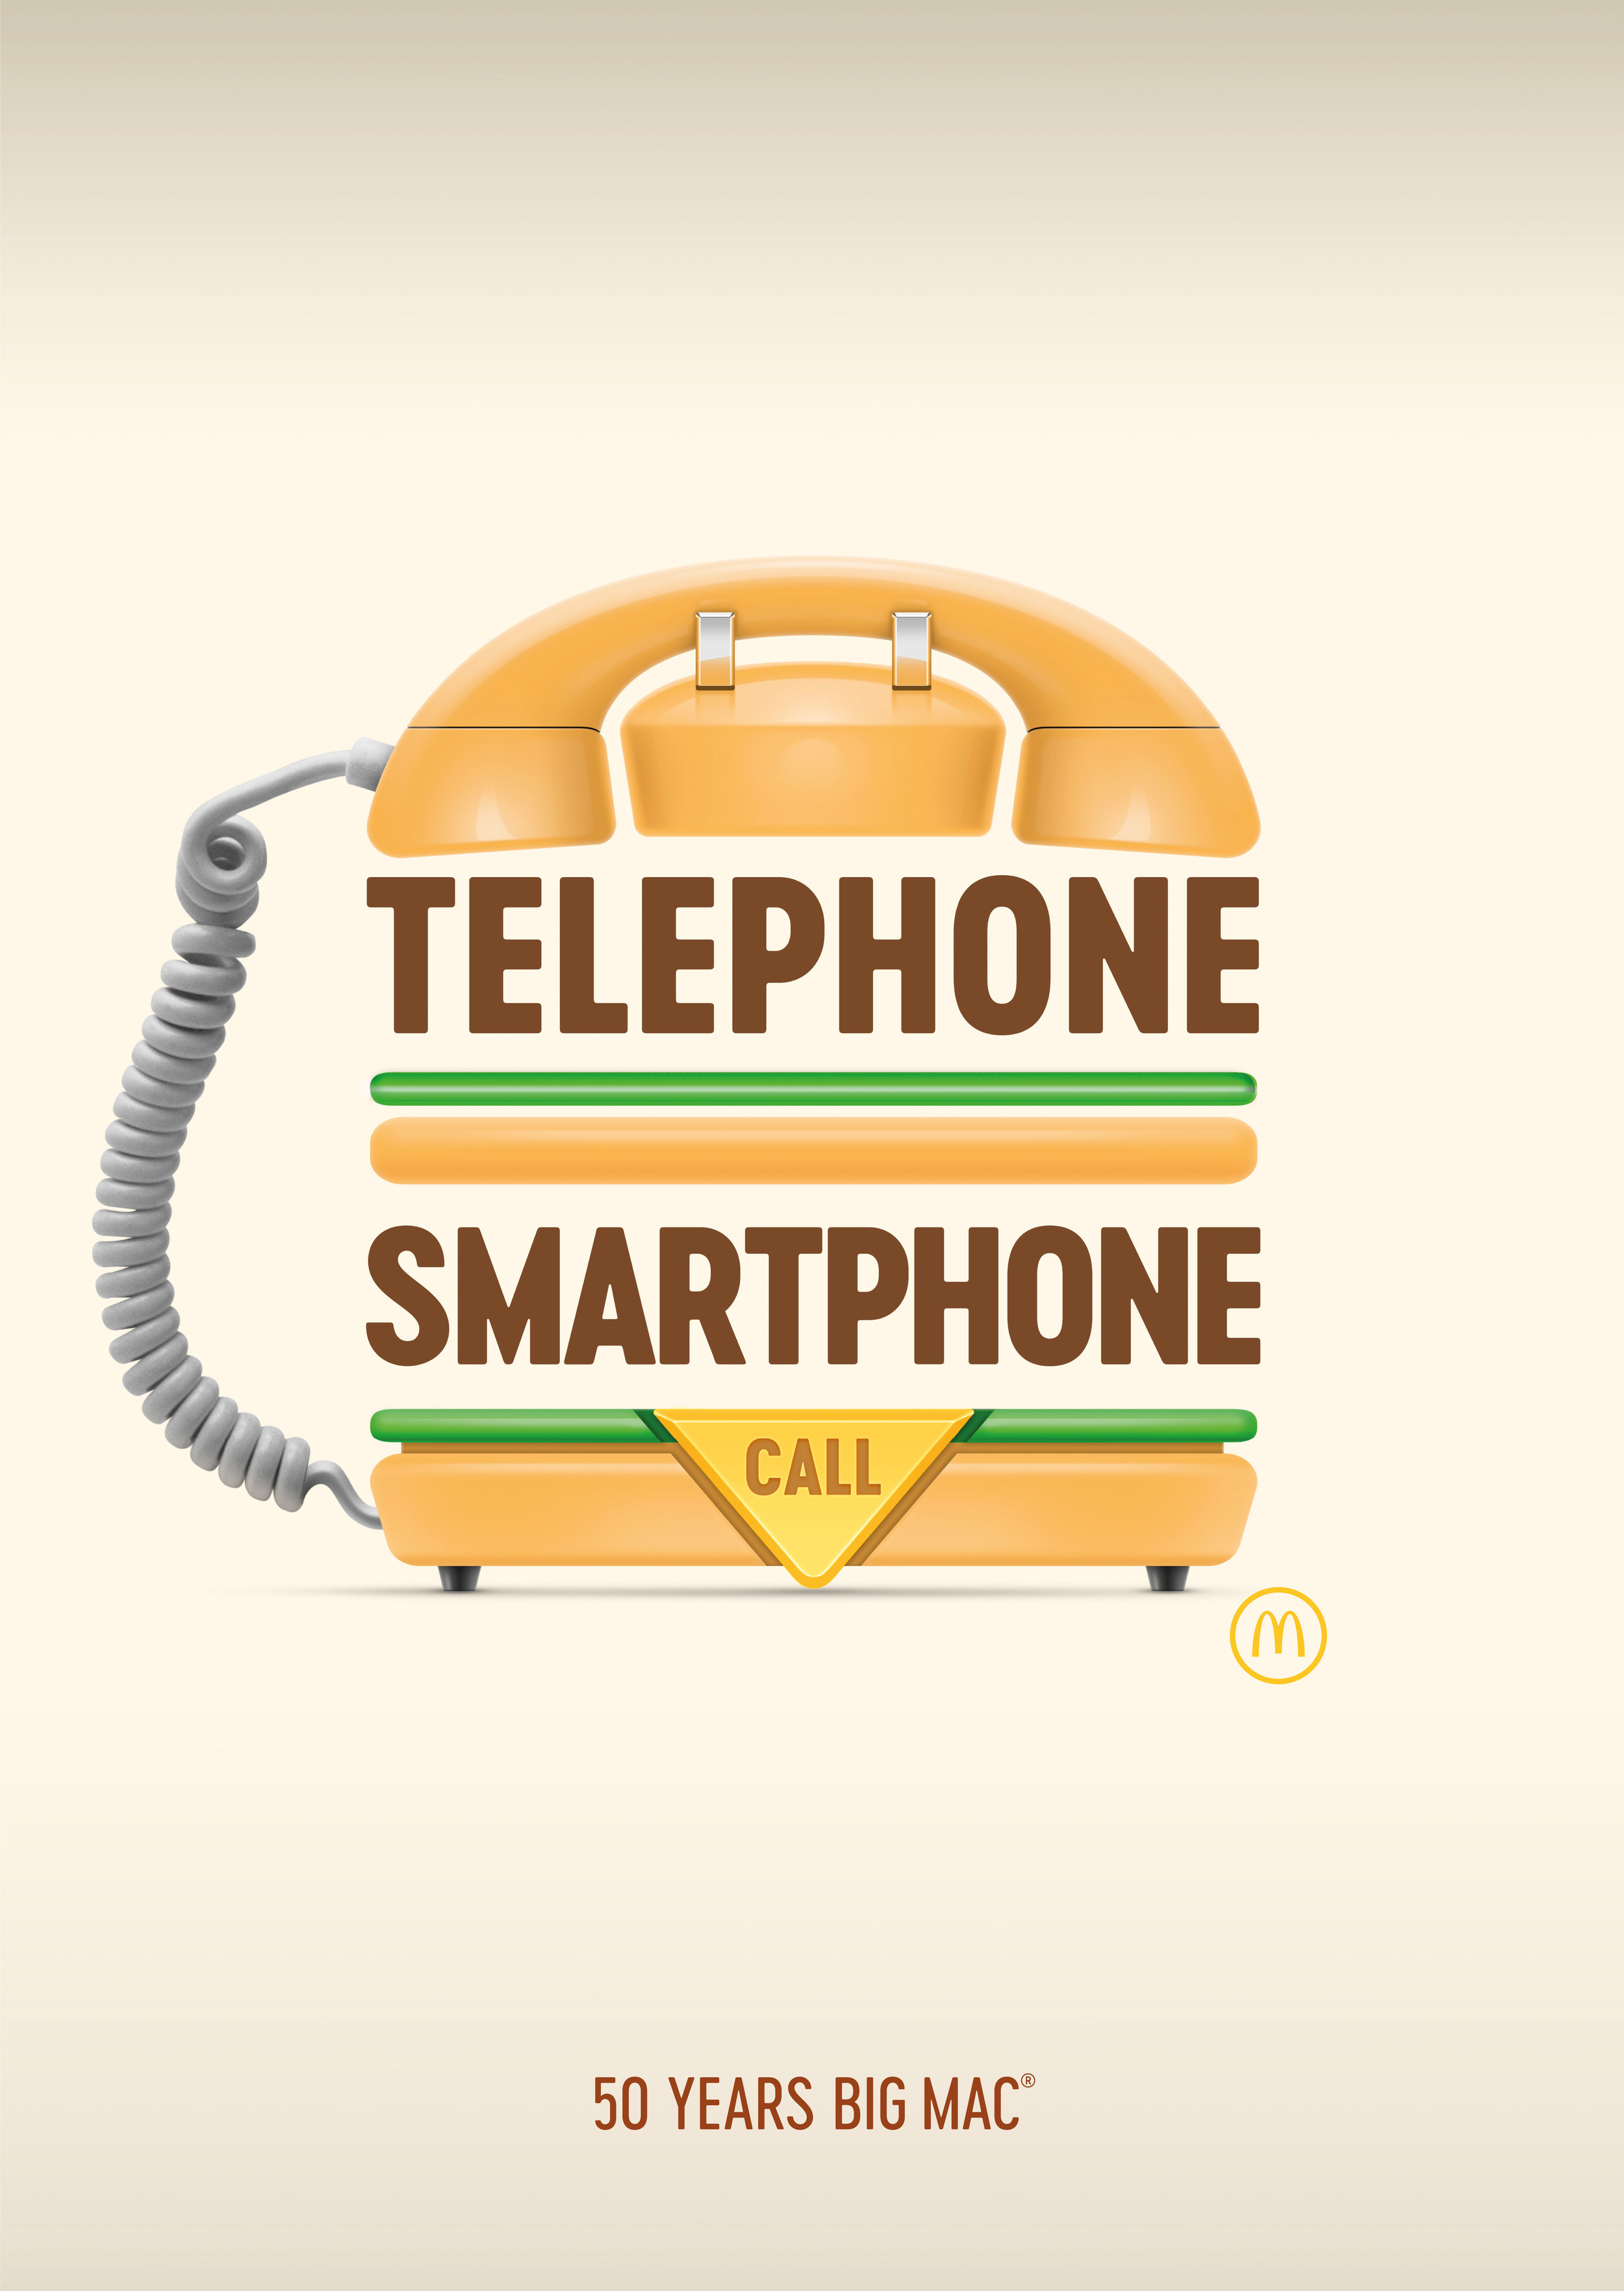 32_Telephone:Smartphone.jpg